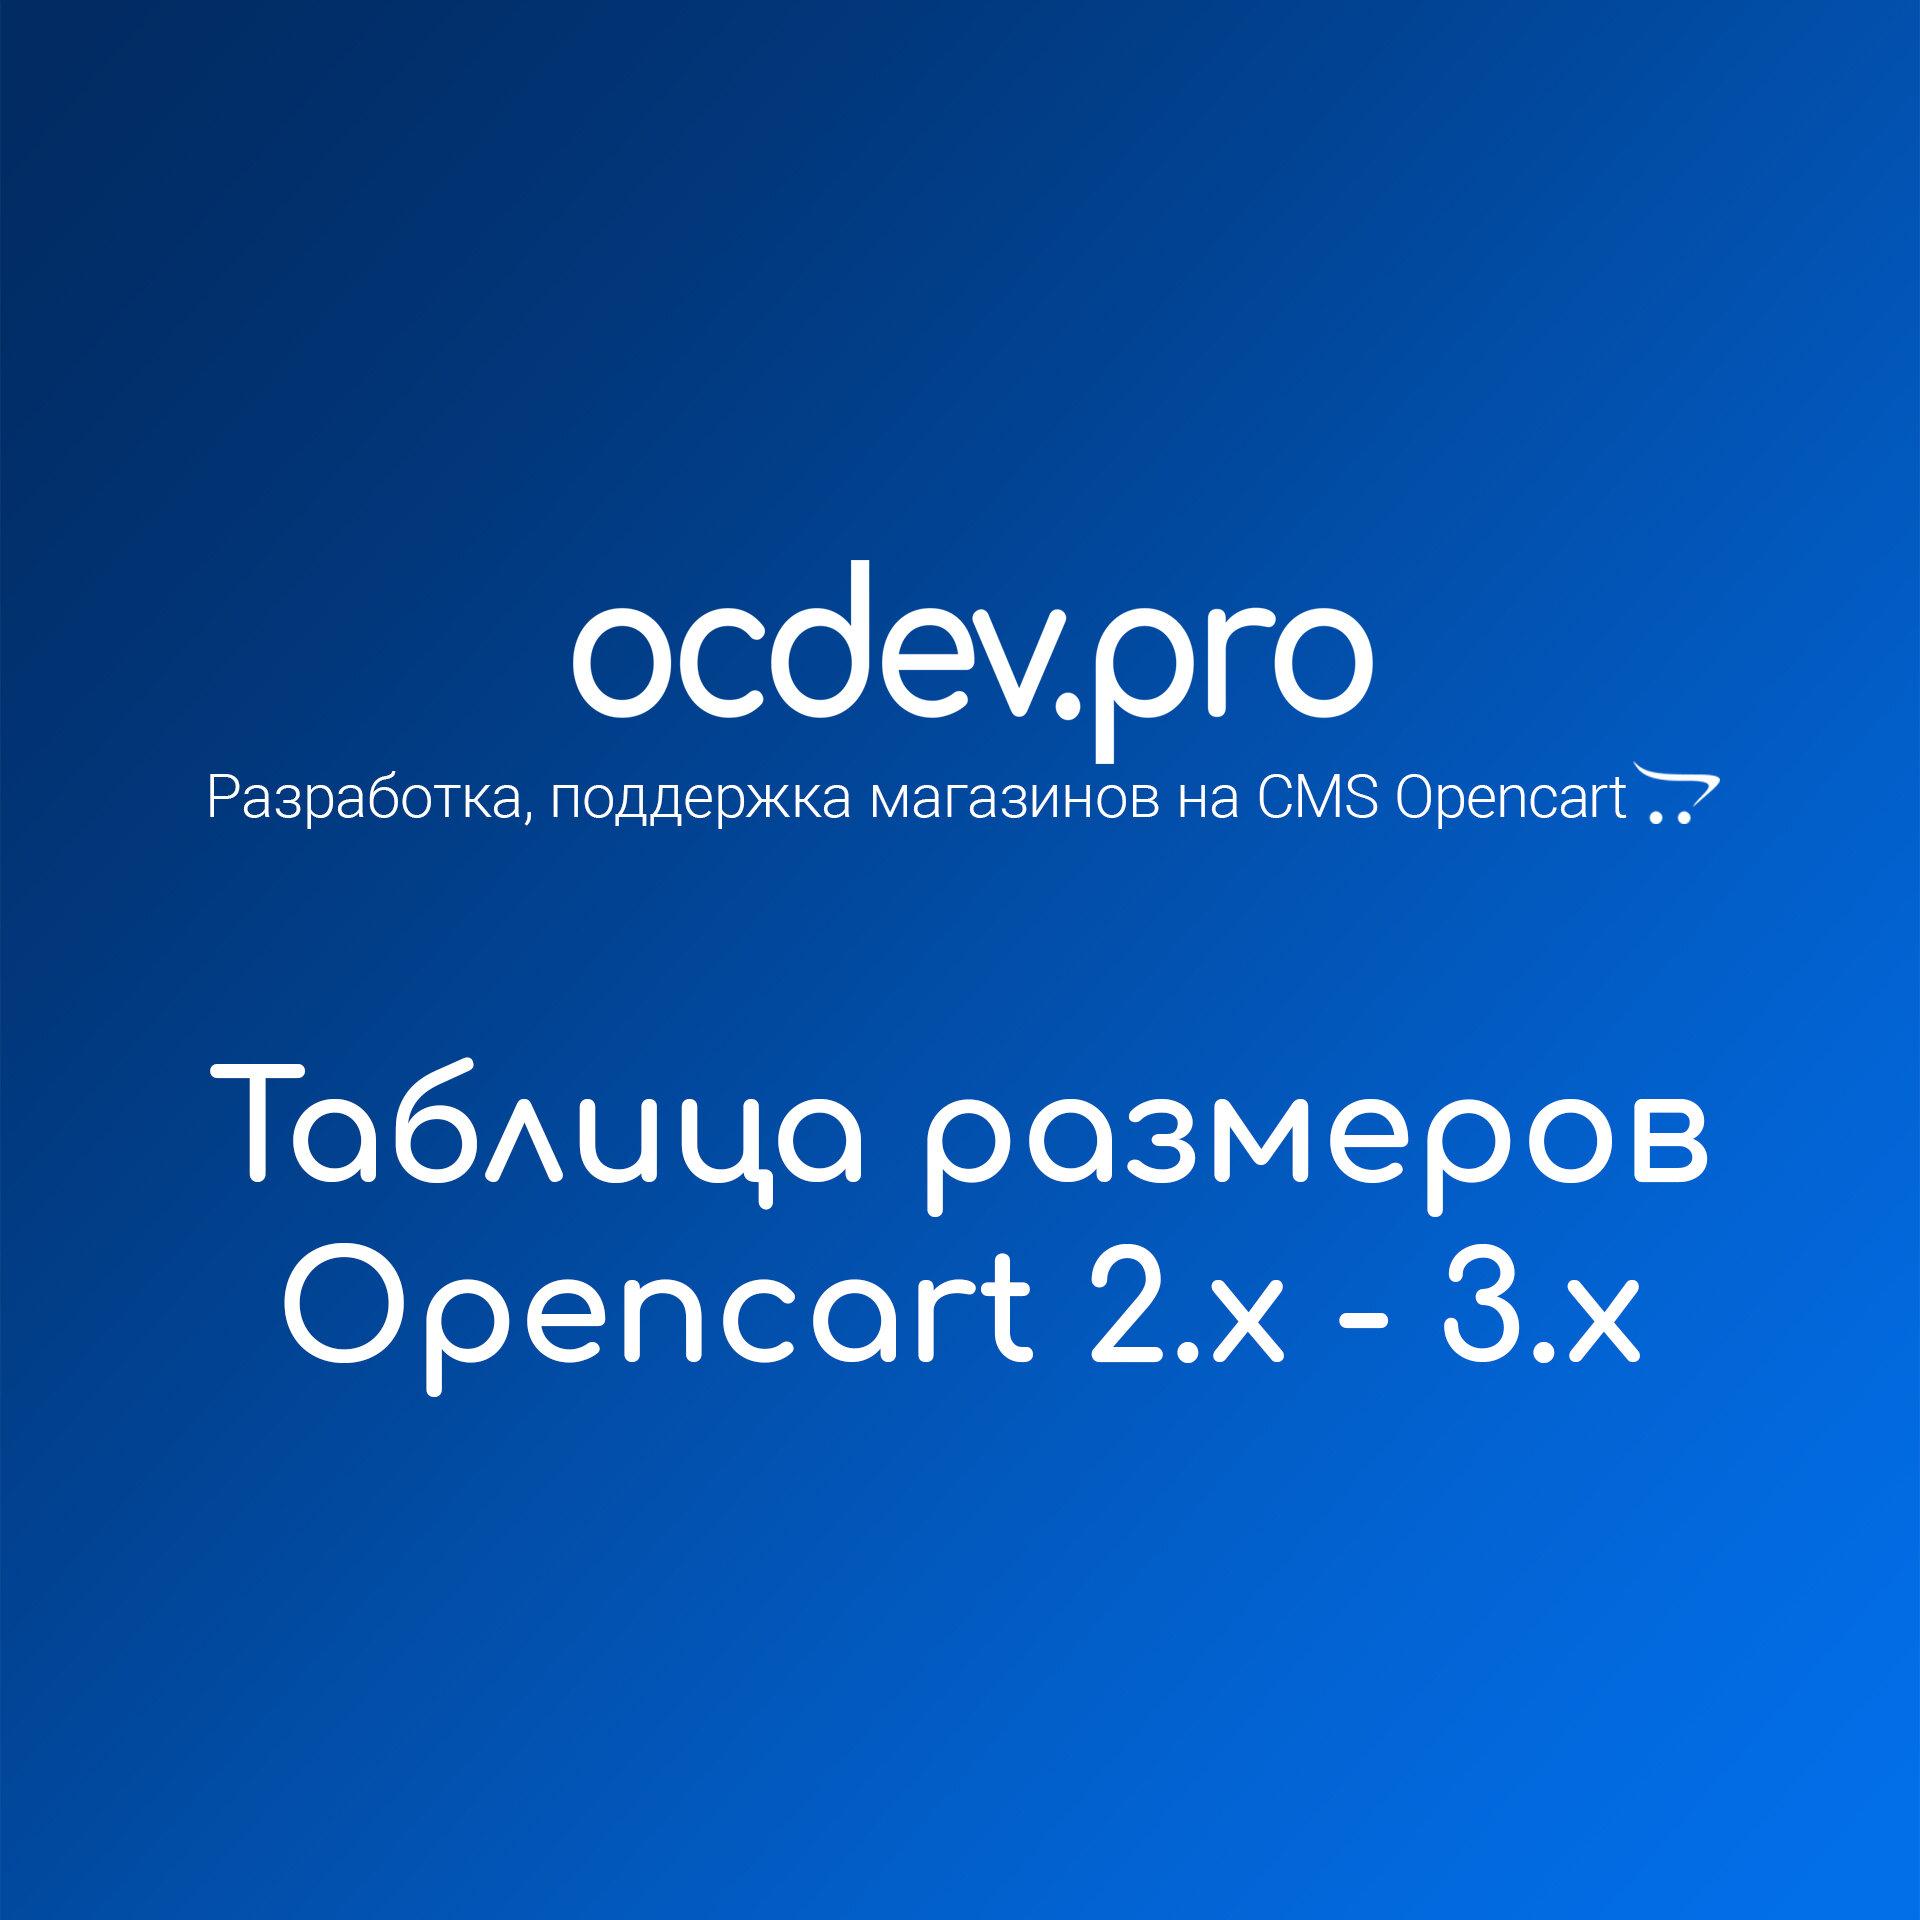 OCDEV.pro - Таблица размеров Opencart